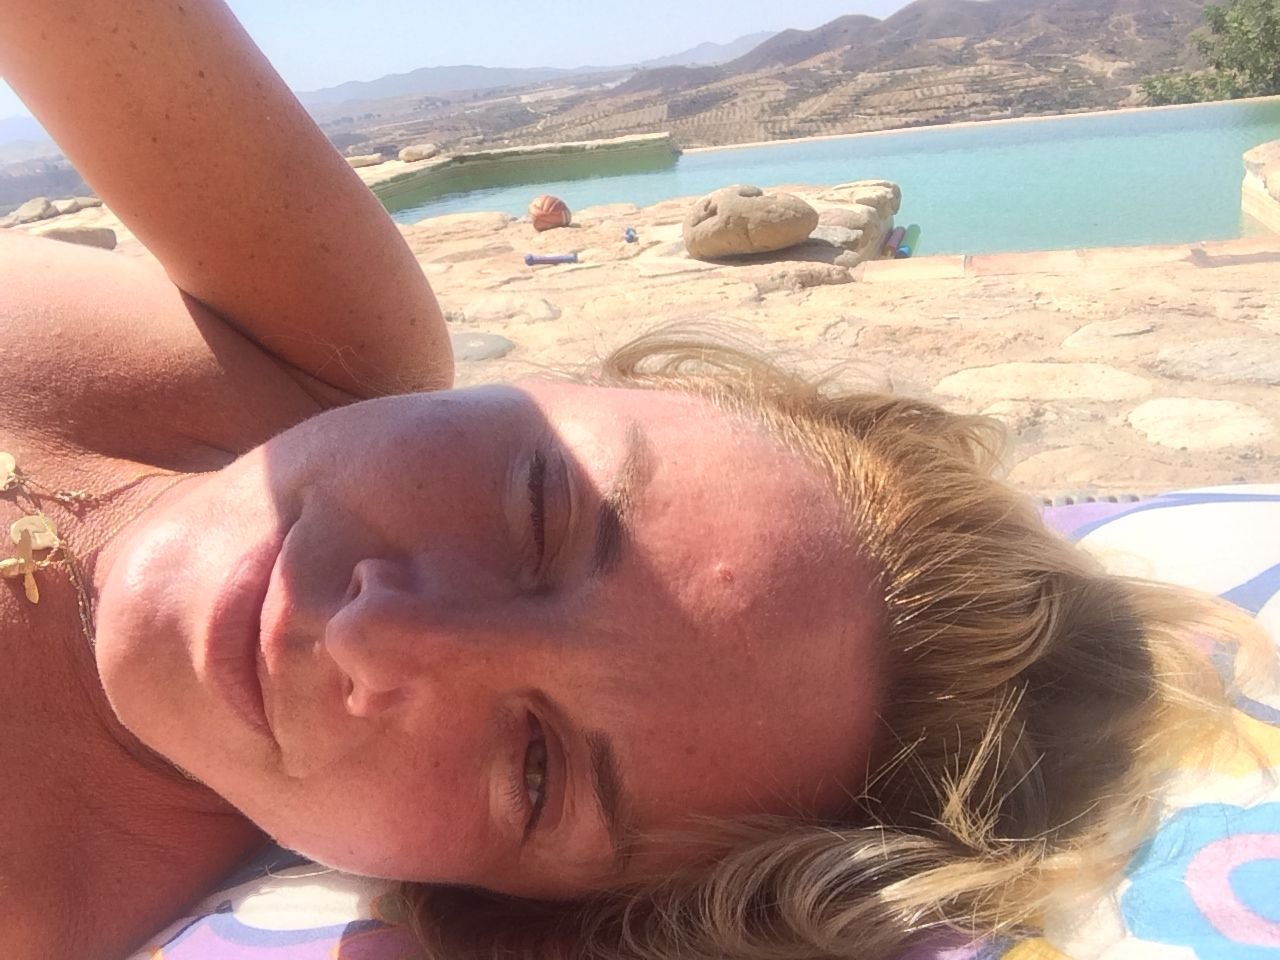 Tamzin outhwaite nude leaked 9 Photos - 2019 year